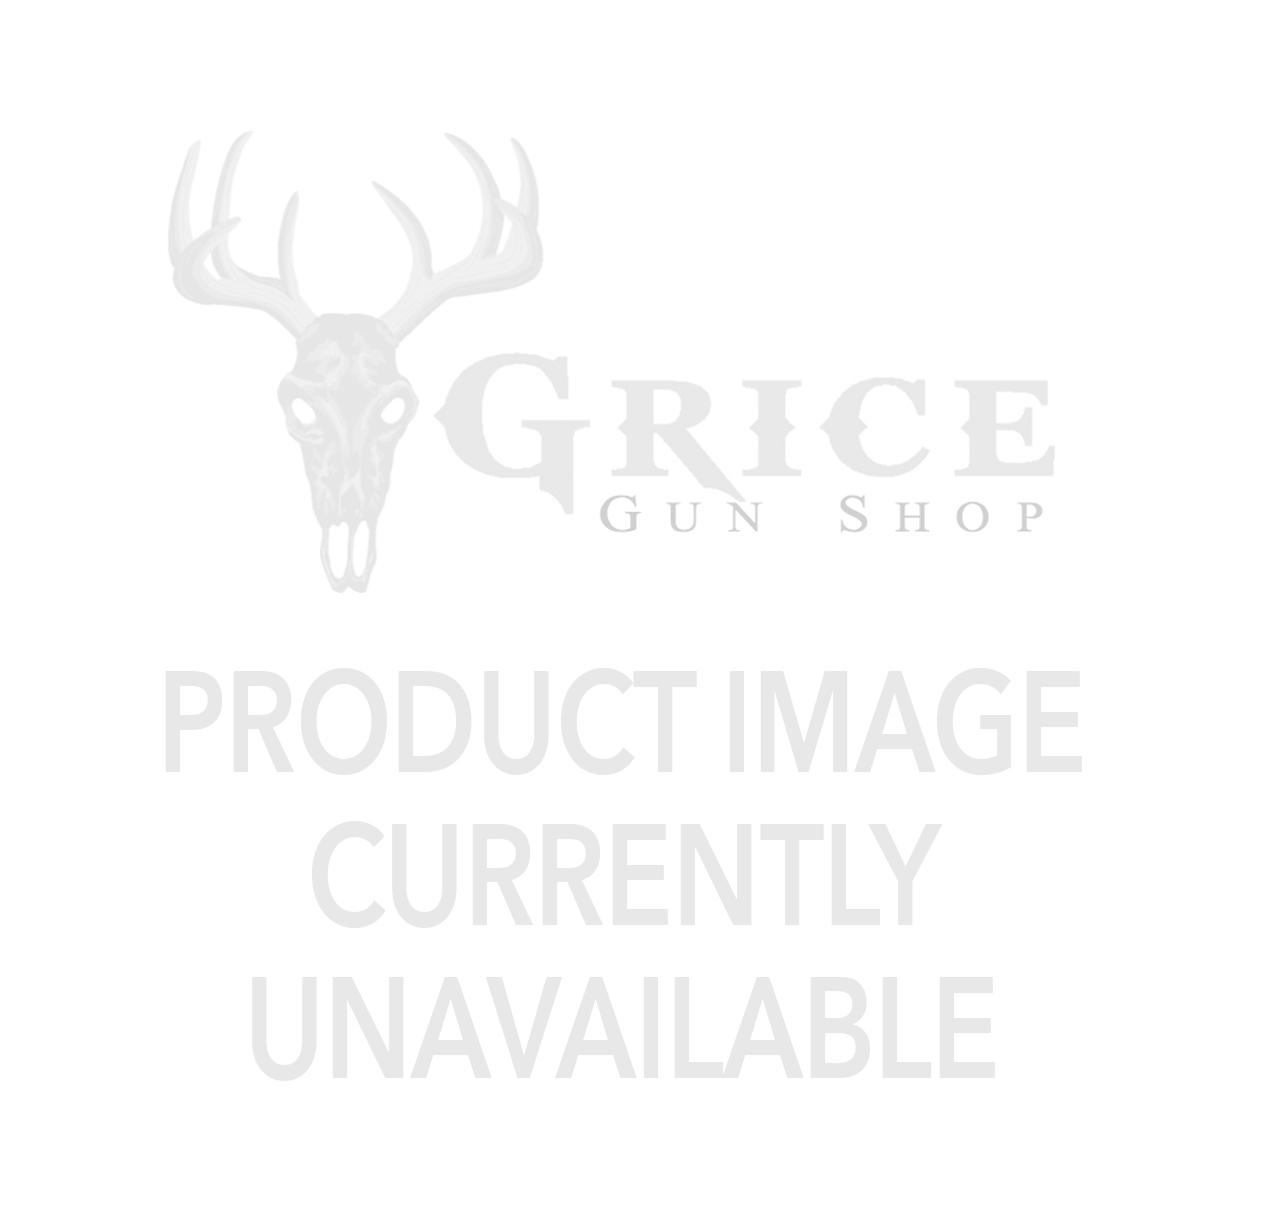 Mossberg - Blaze 25 Round Capacity